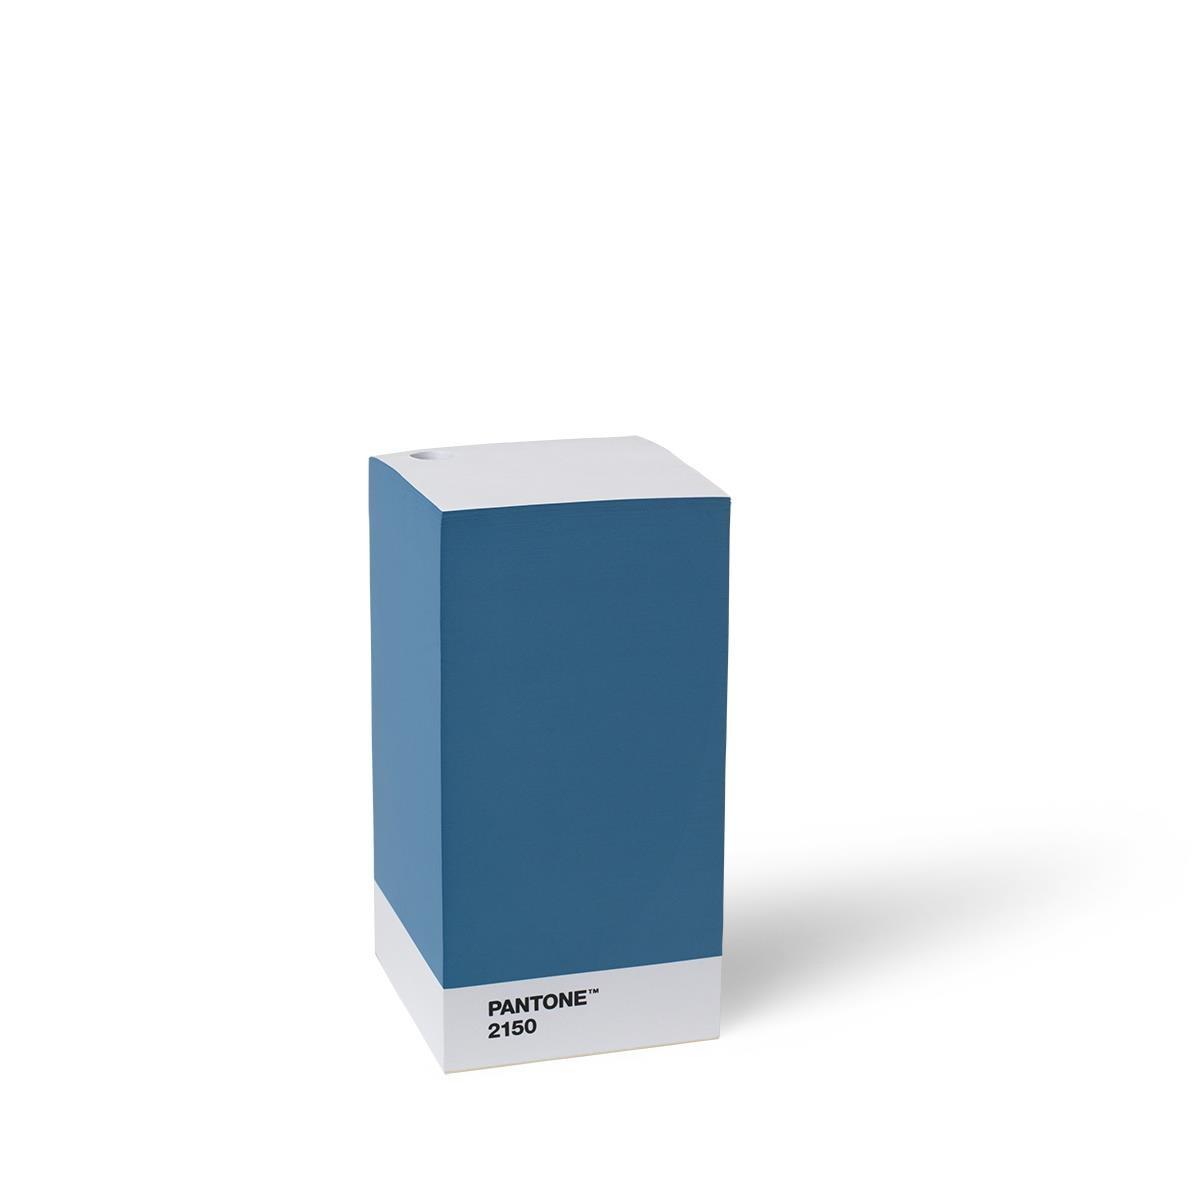 Notizzettelblock Blau 2150 Pantone Büro Produkte